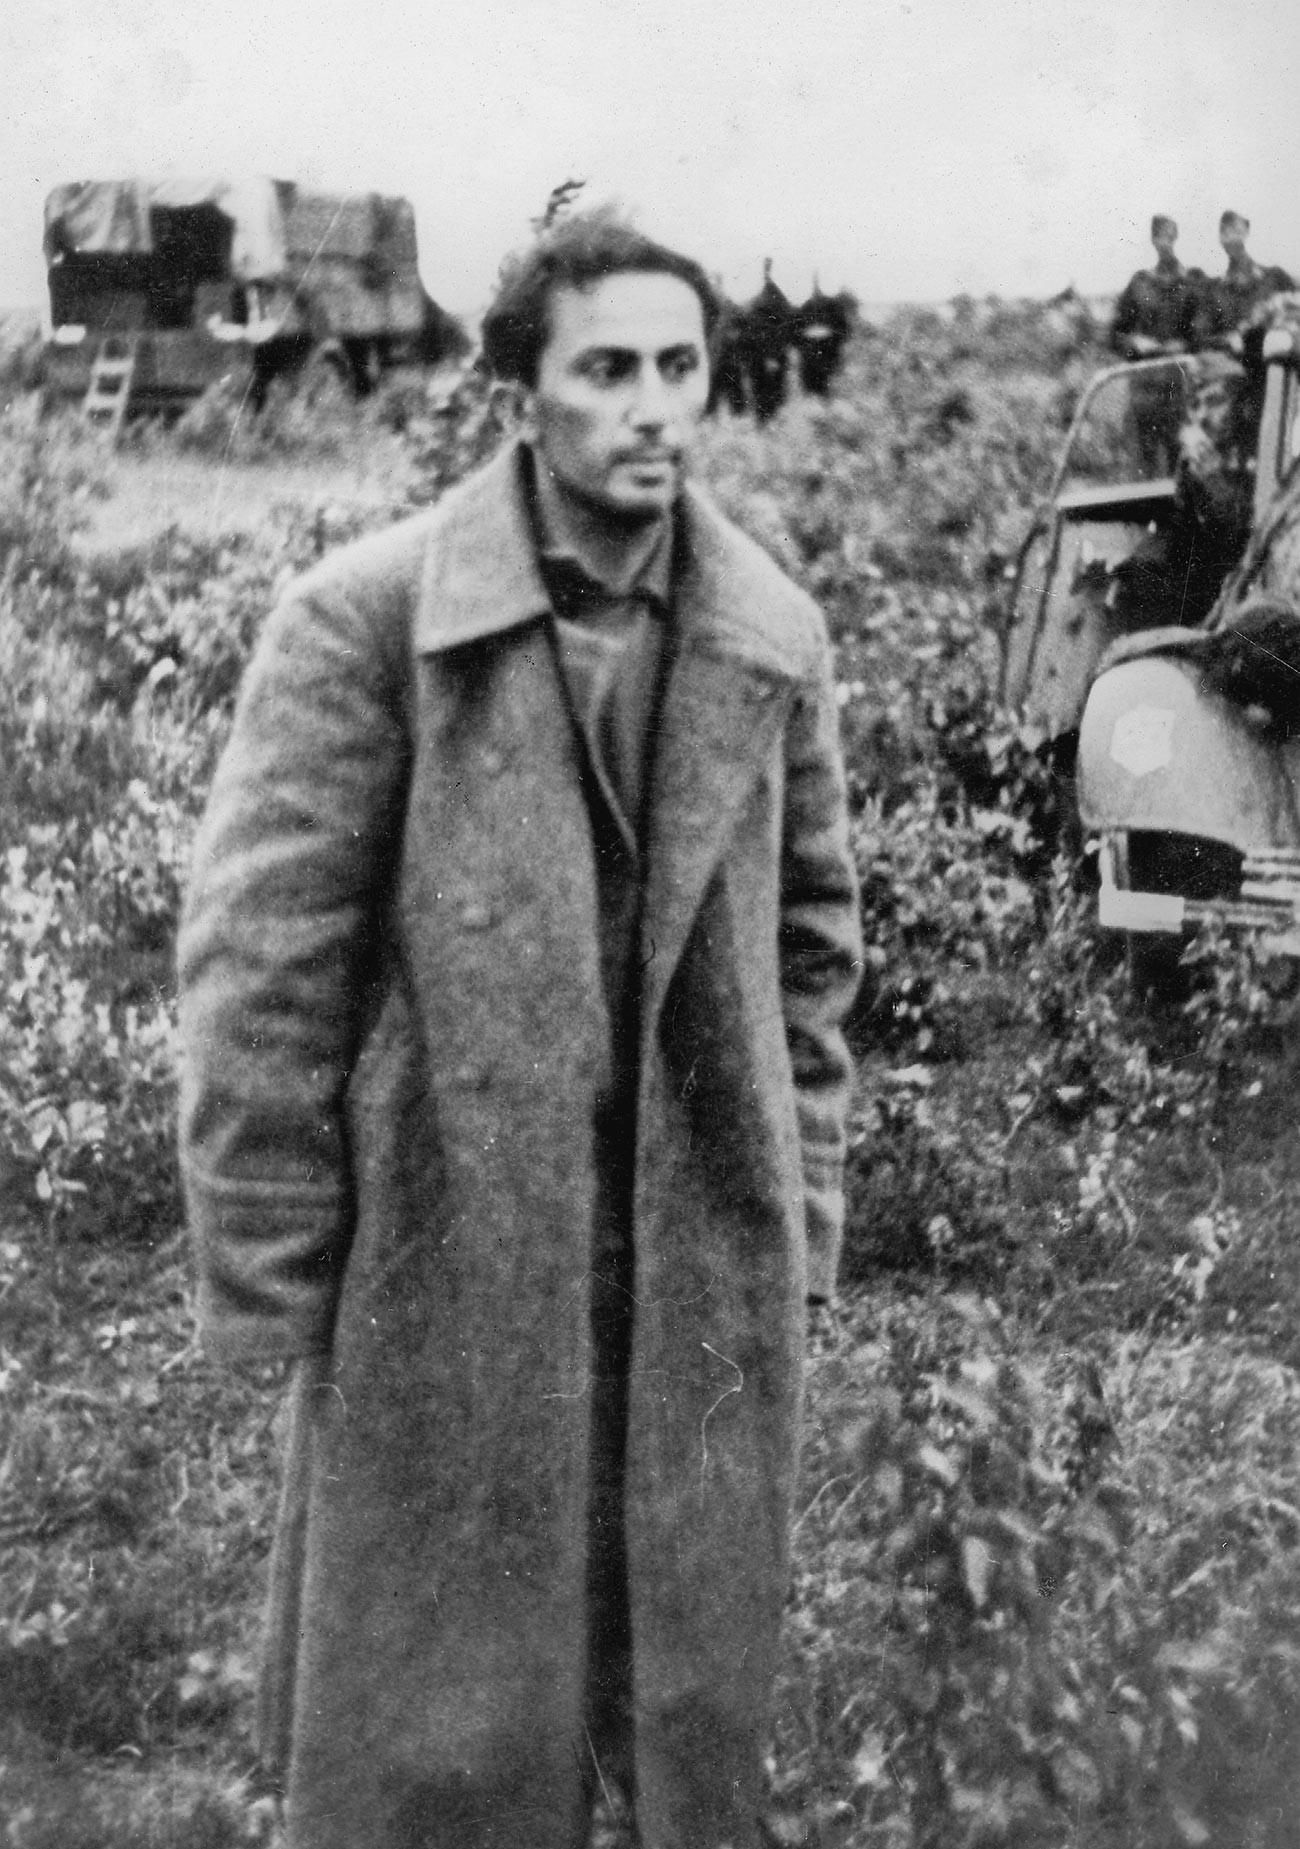 The first son of Josef Stalin, Yakov Dzhugashvili.